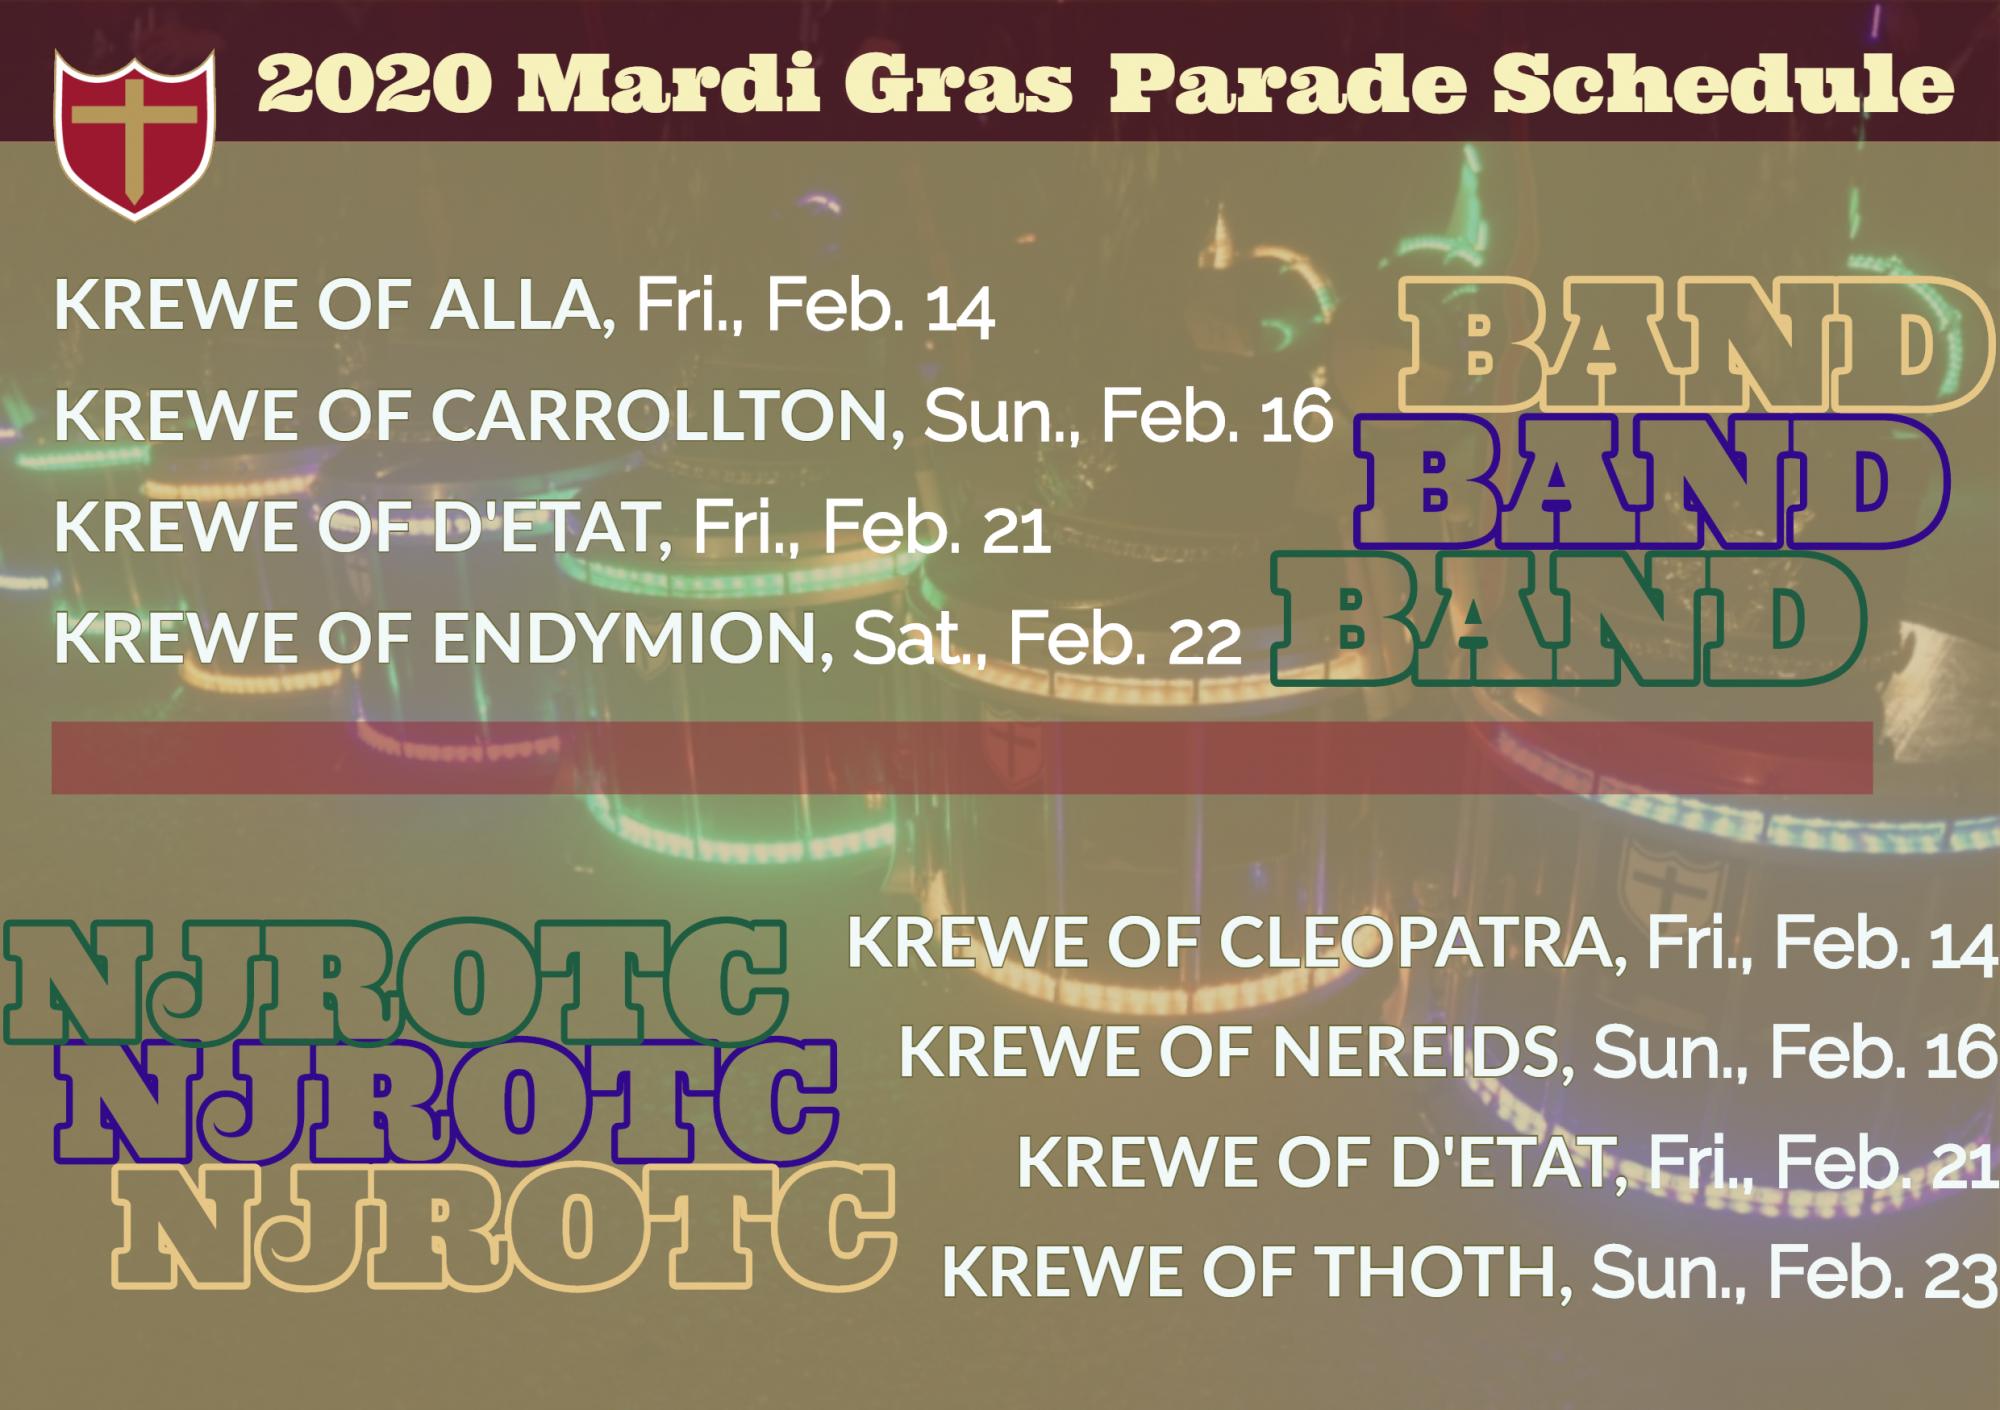 2020 Mardi Gras Parade Schedule